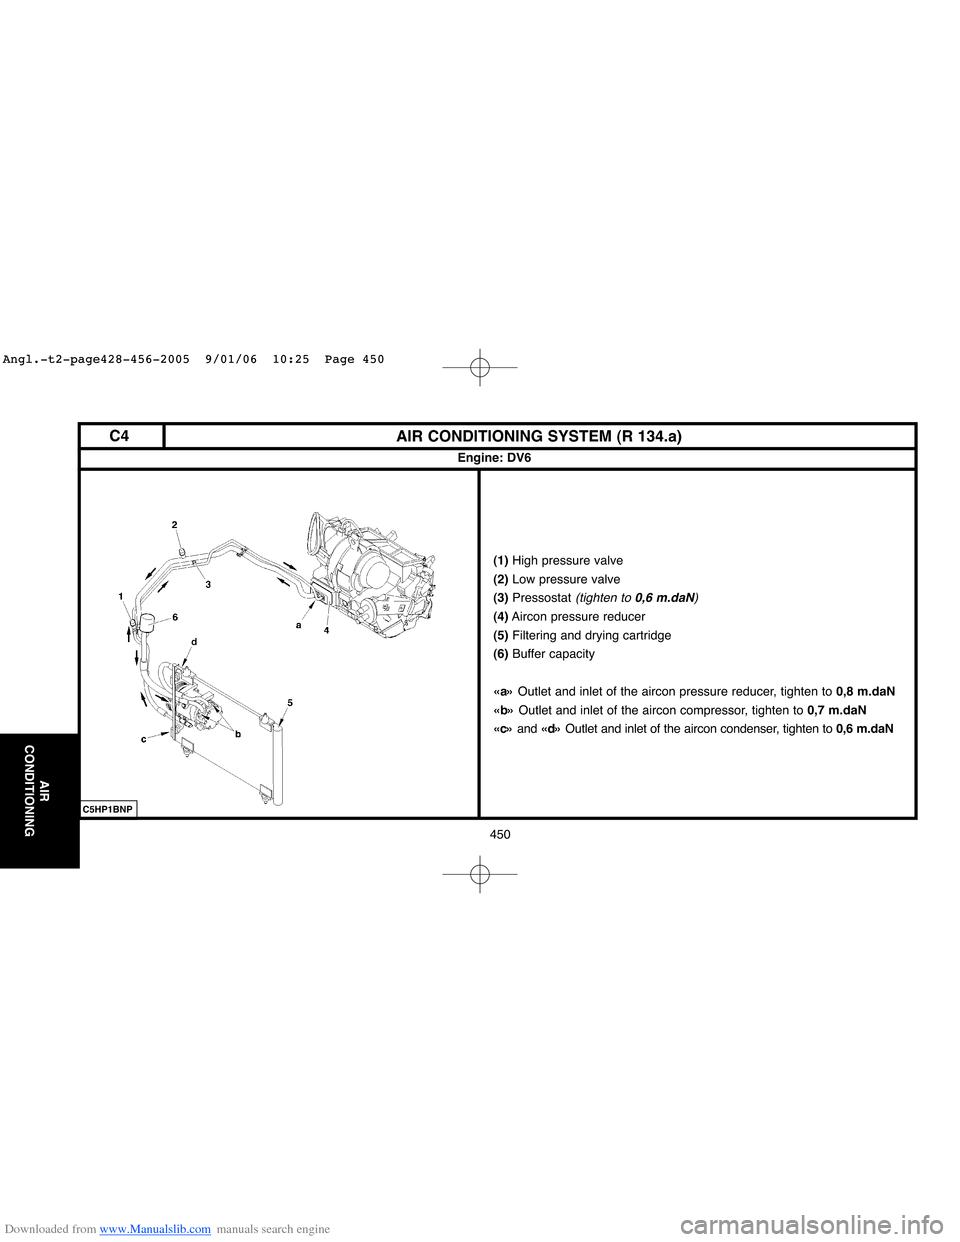 Tdv6 Service Manual Staefa Raptor Wiring Diagram Hp Dv6 2000 Array Engine Citroen Xsara 2005 1 G Workshop Rh Carmanualsonline Info